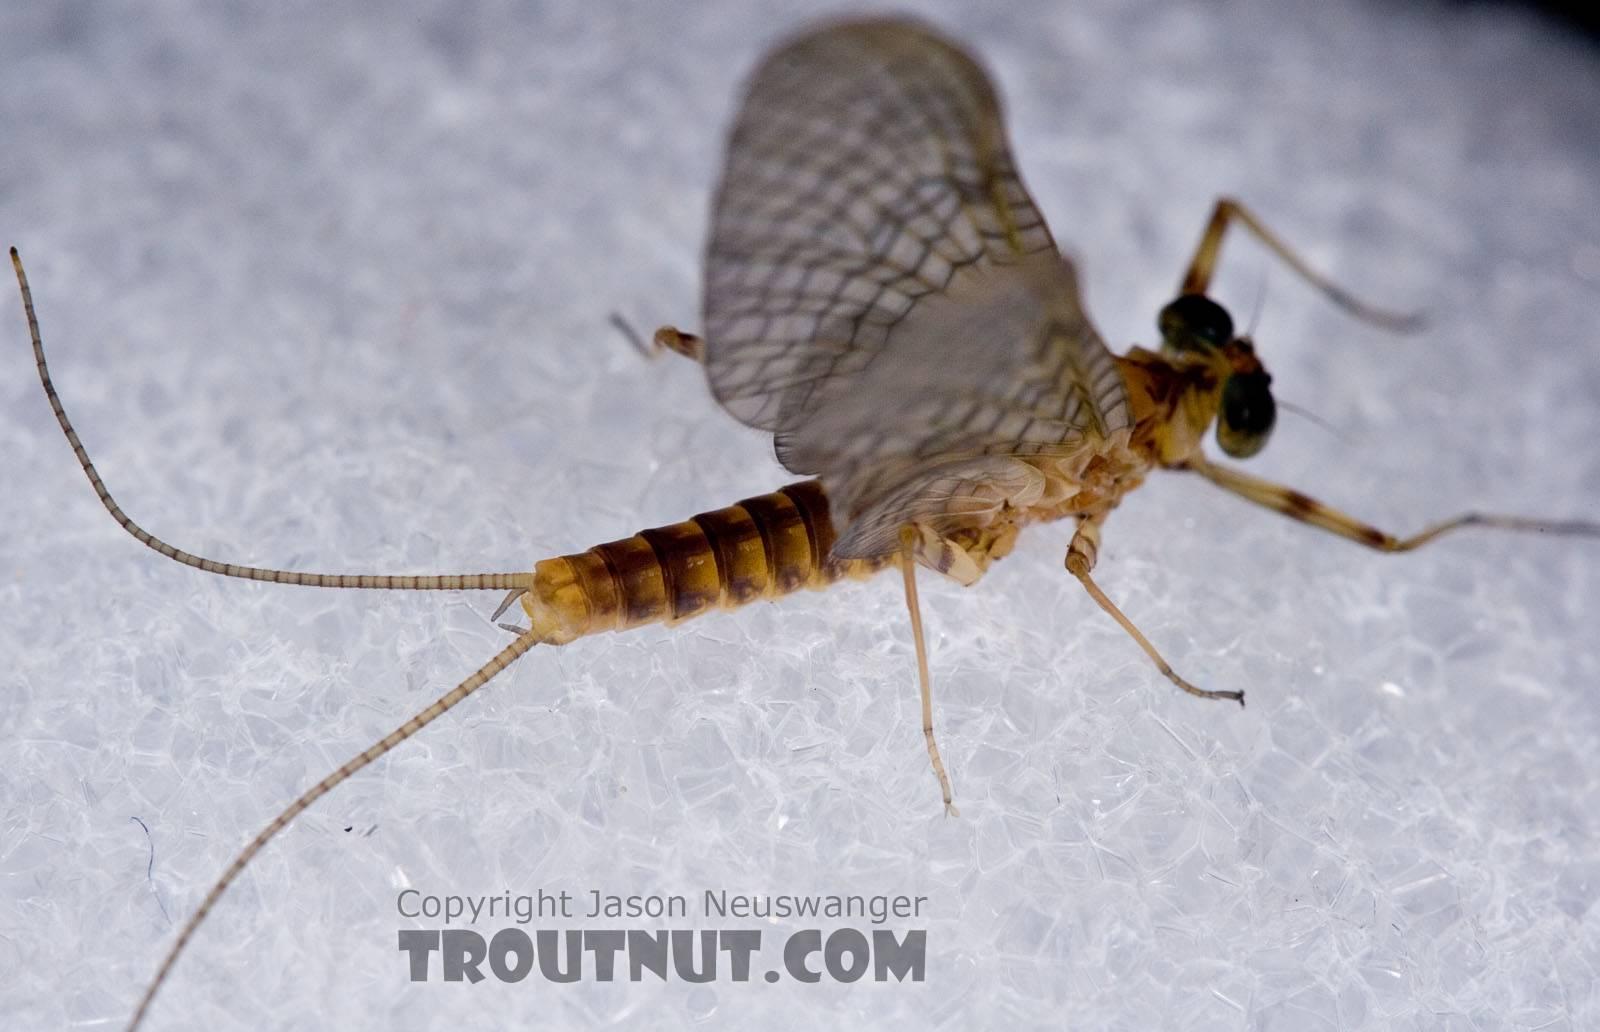 Maccaffertium ithaca (Light Cahill) Mayfly Dun from Paradise Creek in Pennsylvania